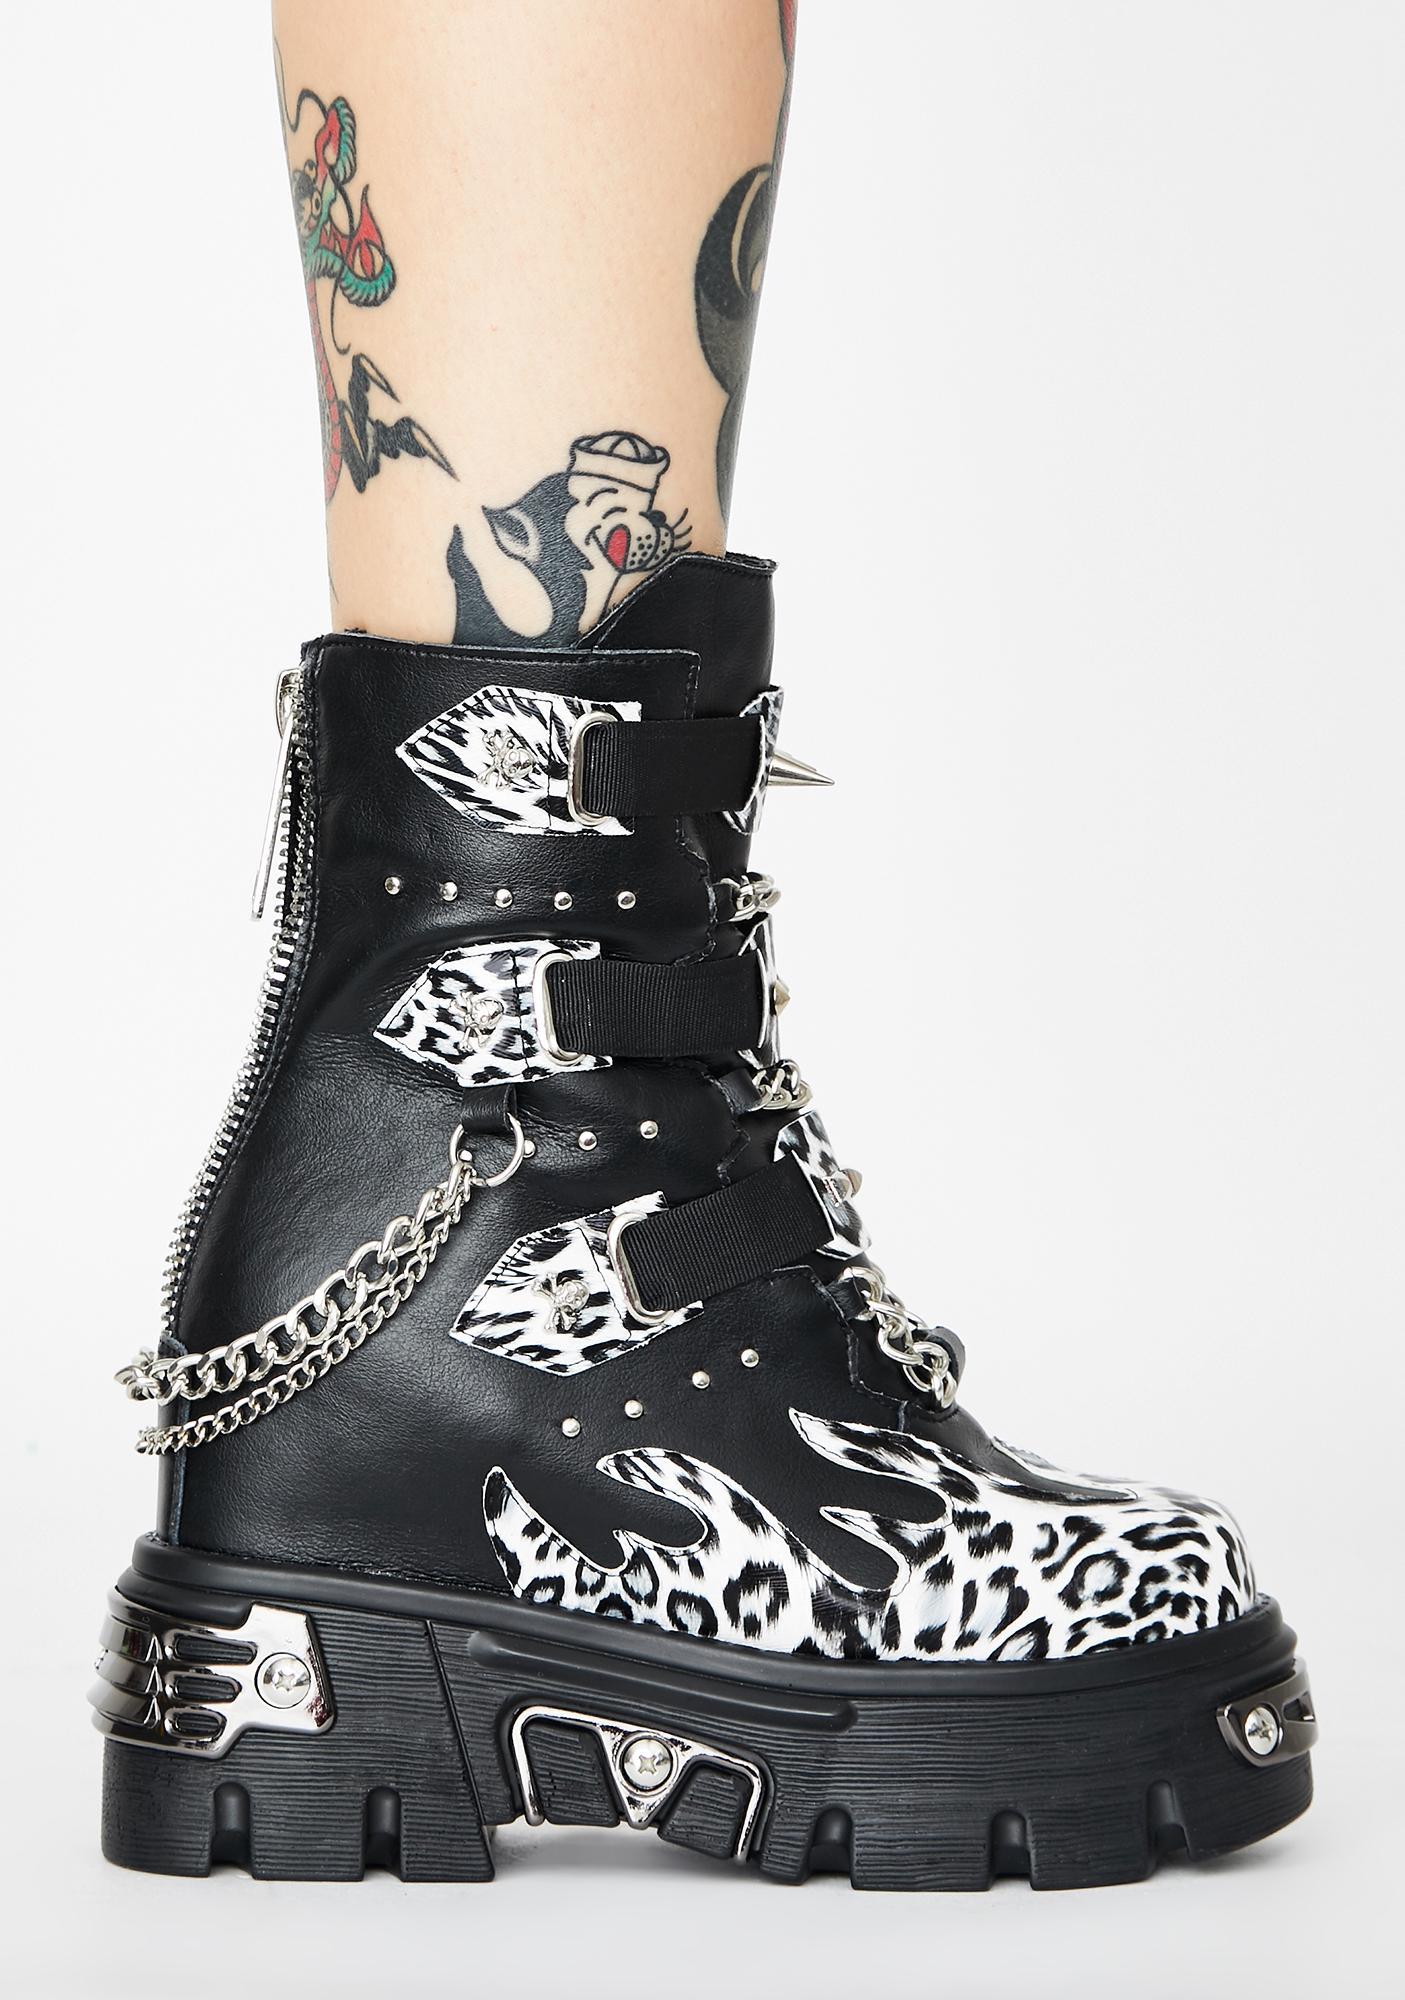 Savage Delinquent Dreamz Platform Boots